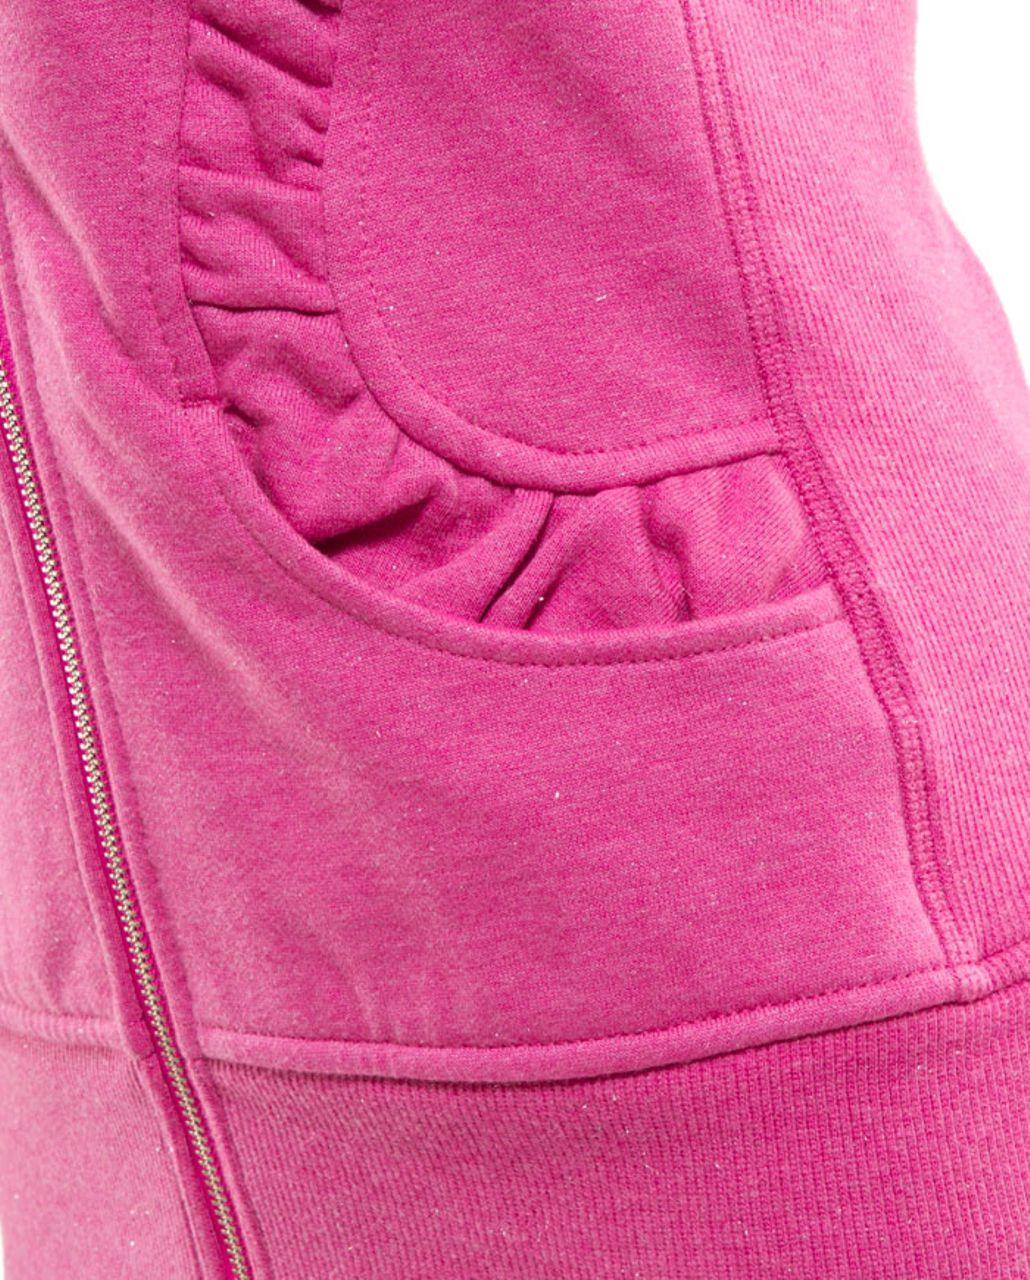 Lululemon Cuddle Up Jacket - Heathered Paris Pink /  Paris Pink